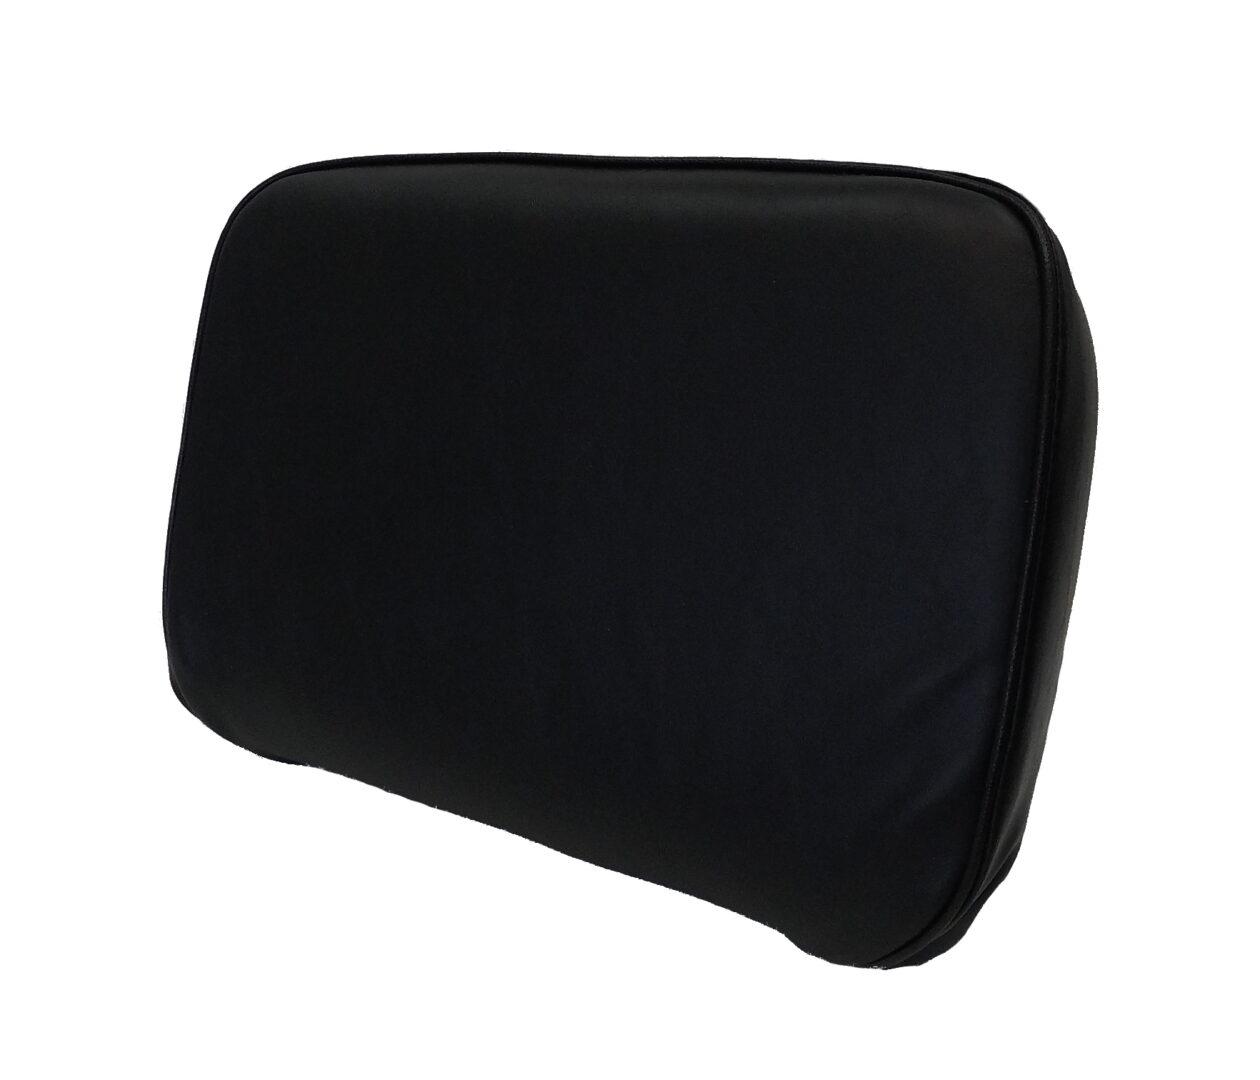 STD BK - Standard Back Cushion